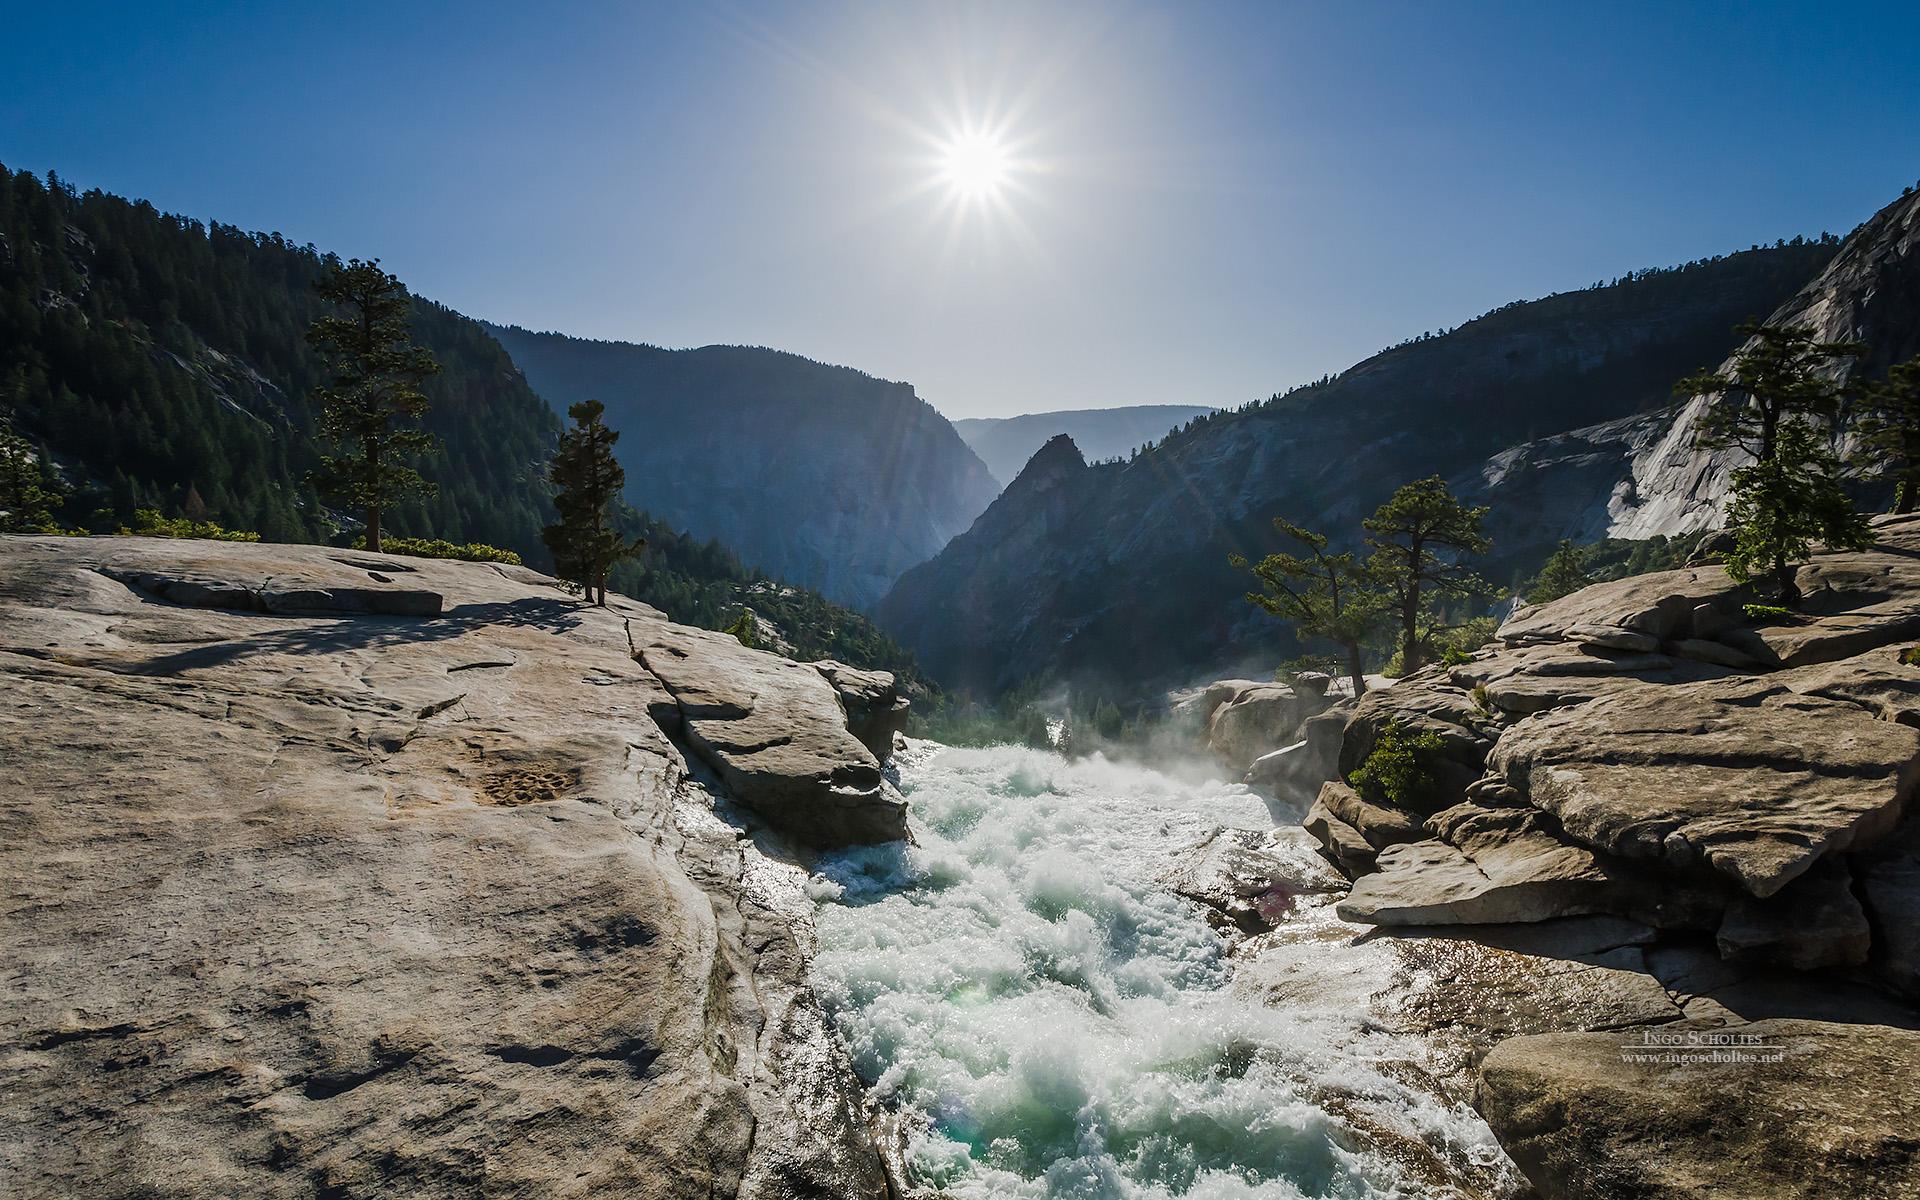 HD Wallpapers Nevada Fall Yosemite National Park